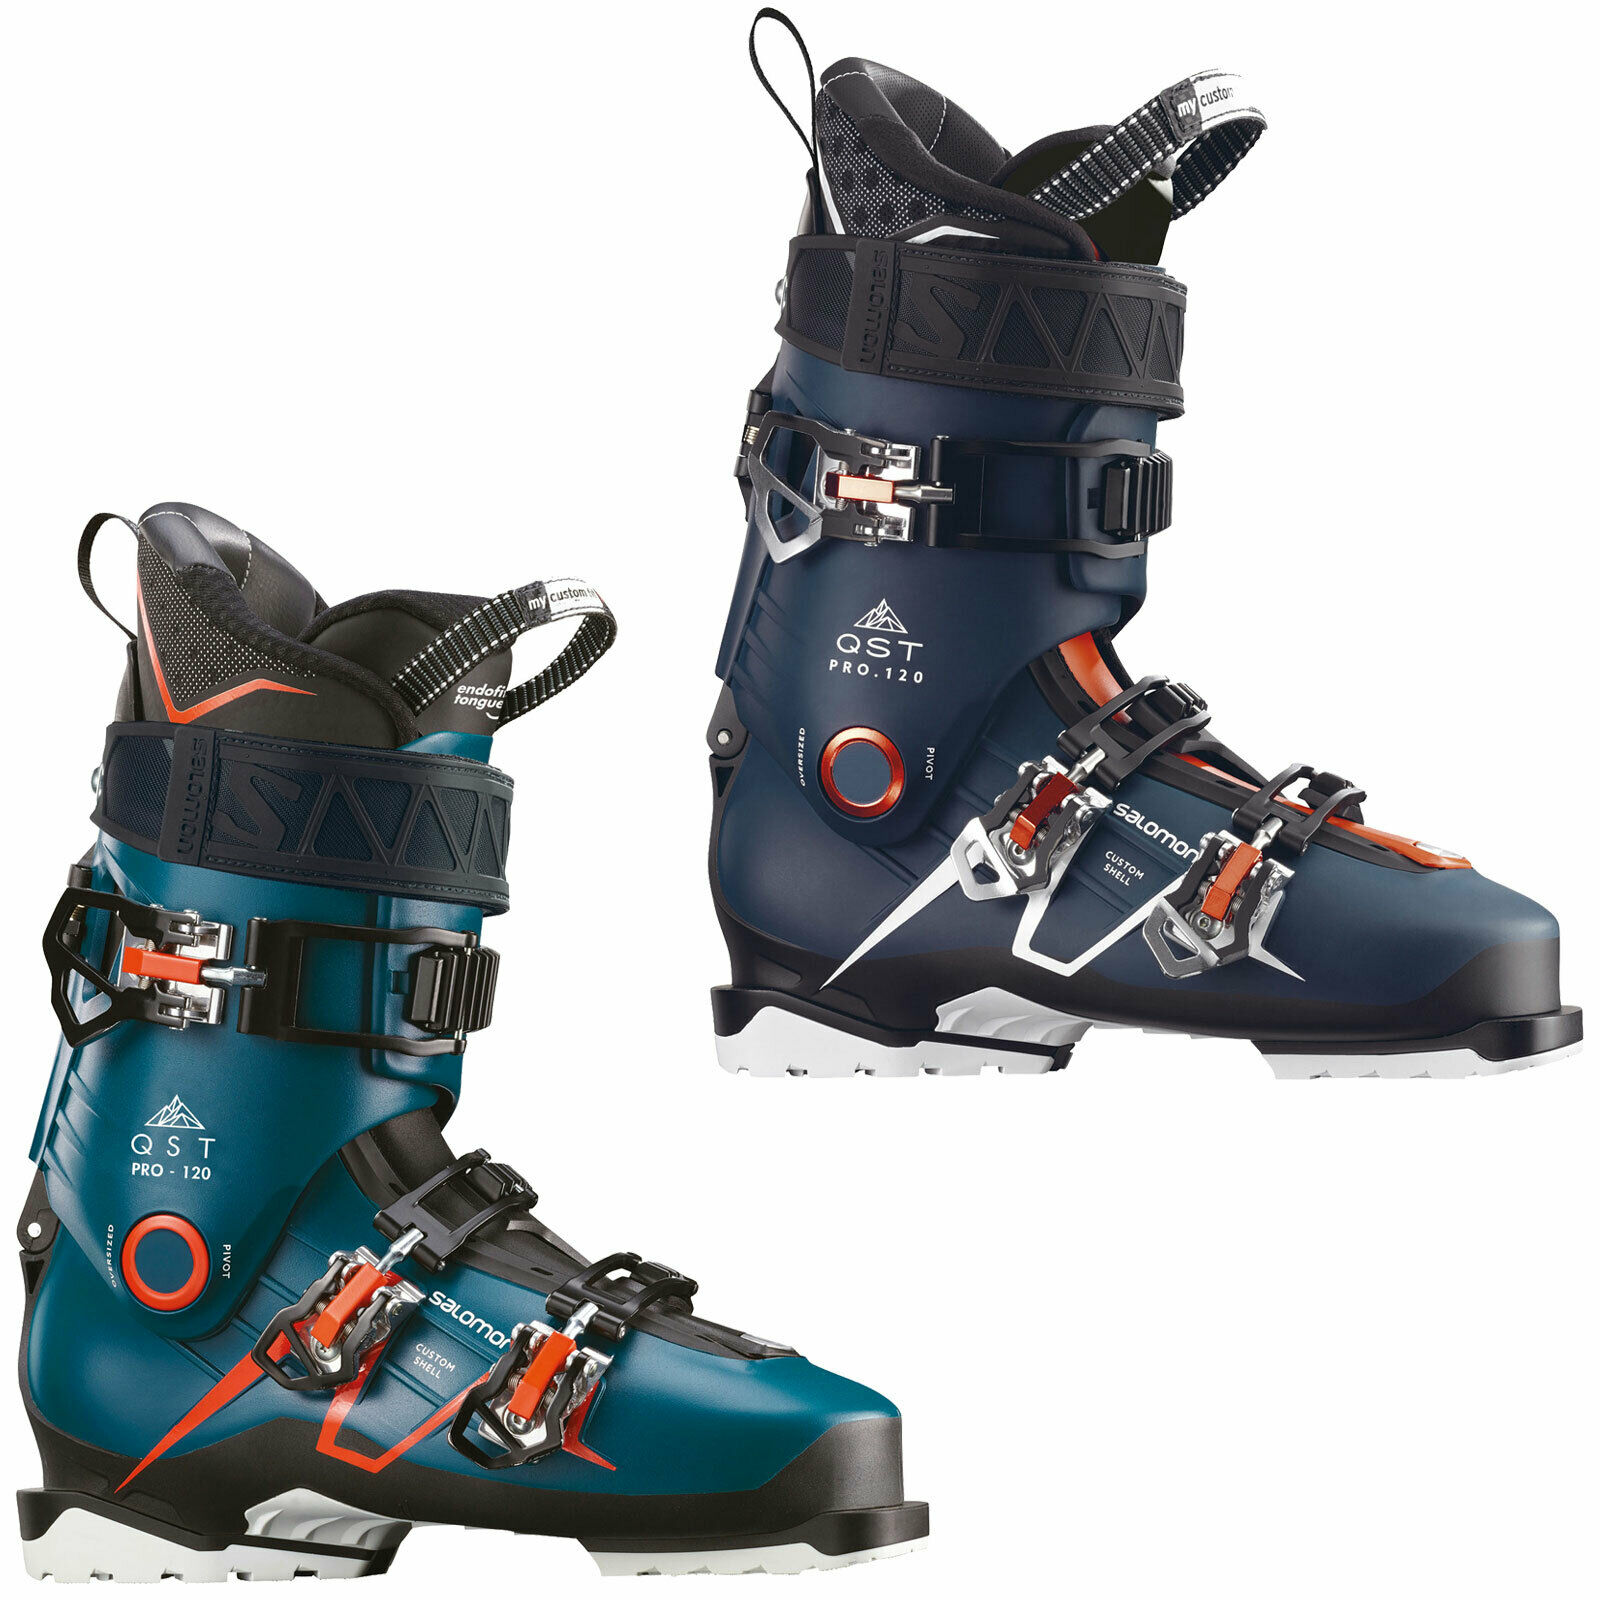 Salomon Qst pro 120 Men's Ski Boots Shoes Skiboot all Mountain Piste New